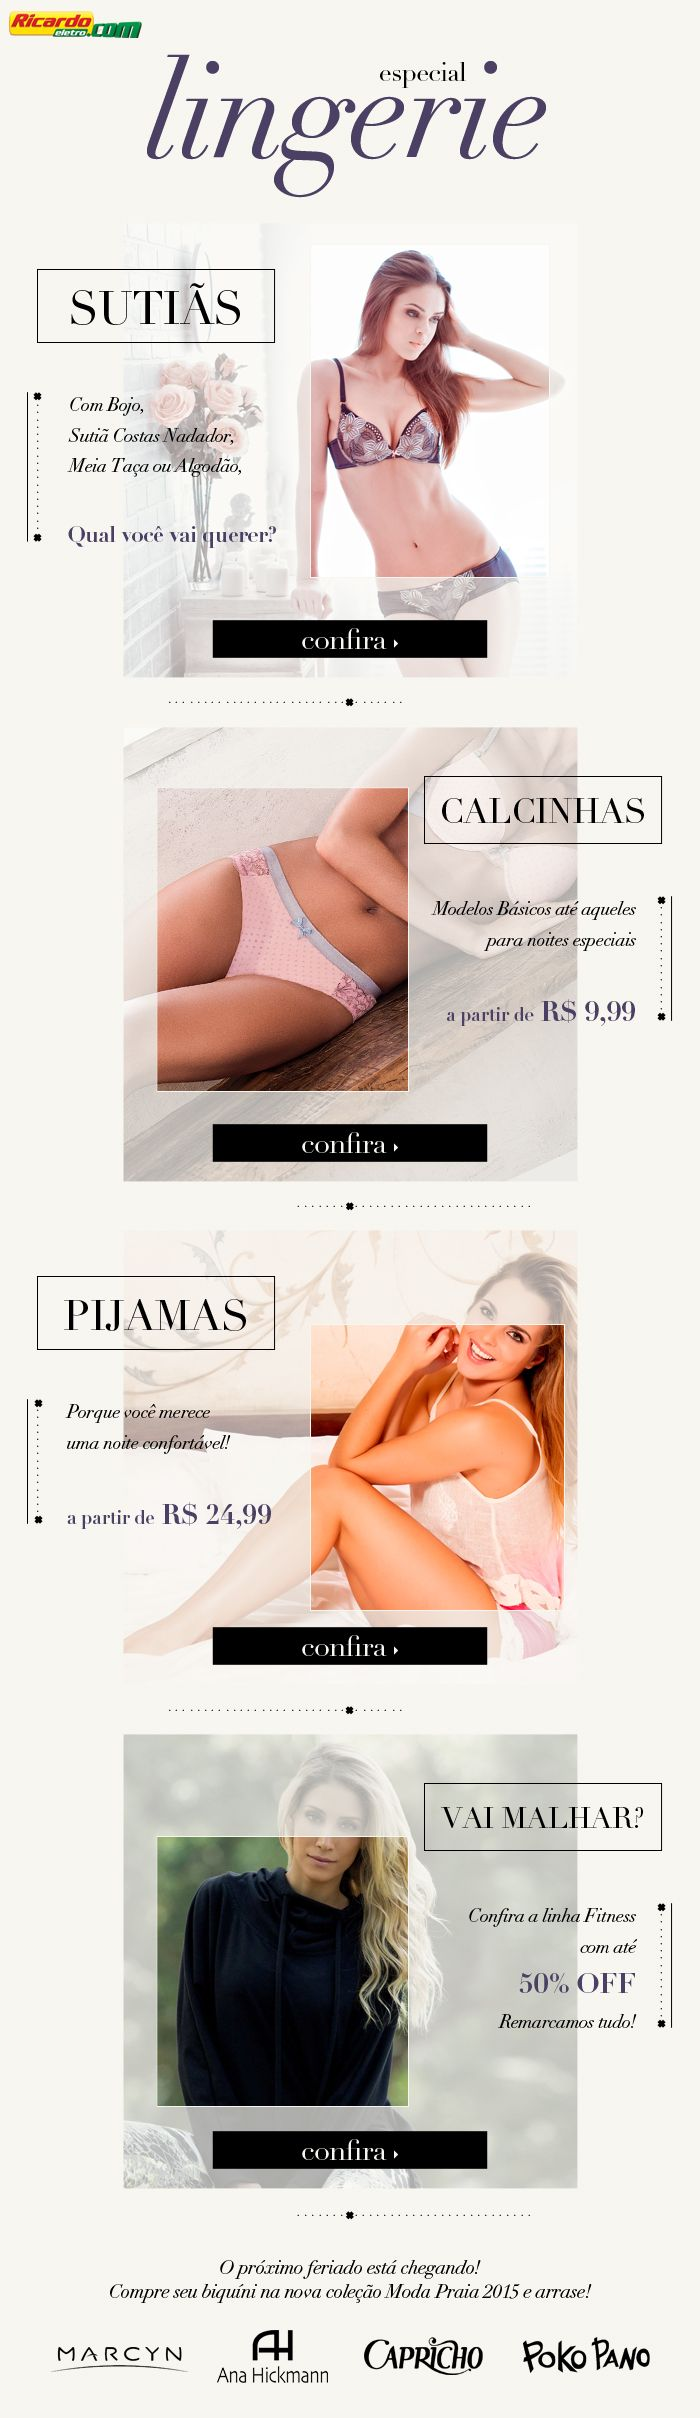 E-mail Marketing Lingerie #email #webdesign #design #lingerie #woman #sexy #best #comercial #photoshop #minimalistdesign